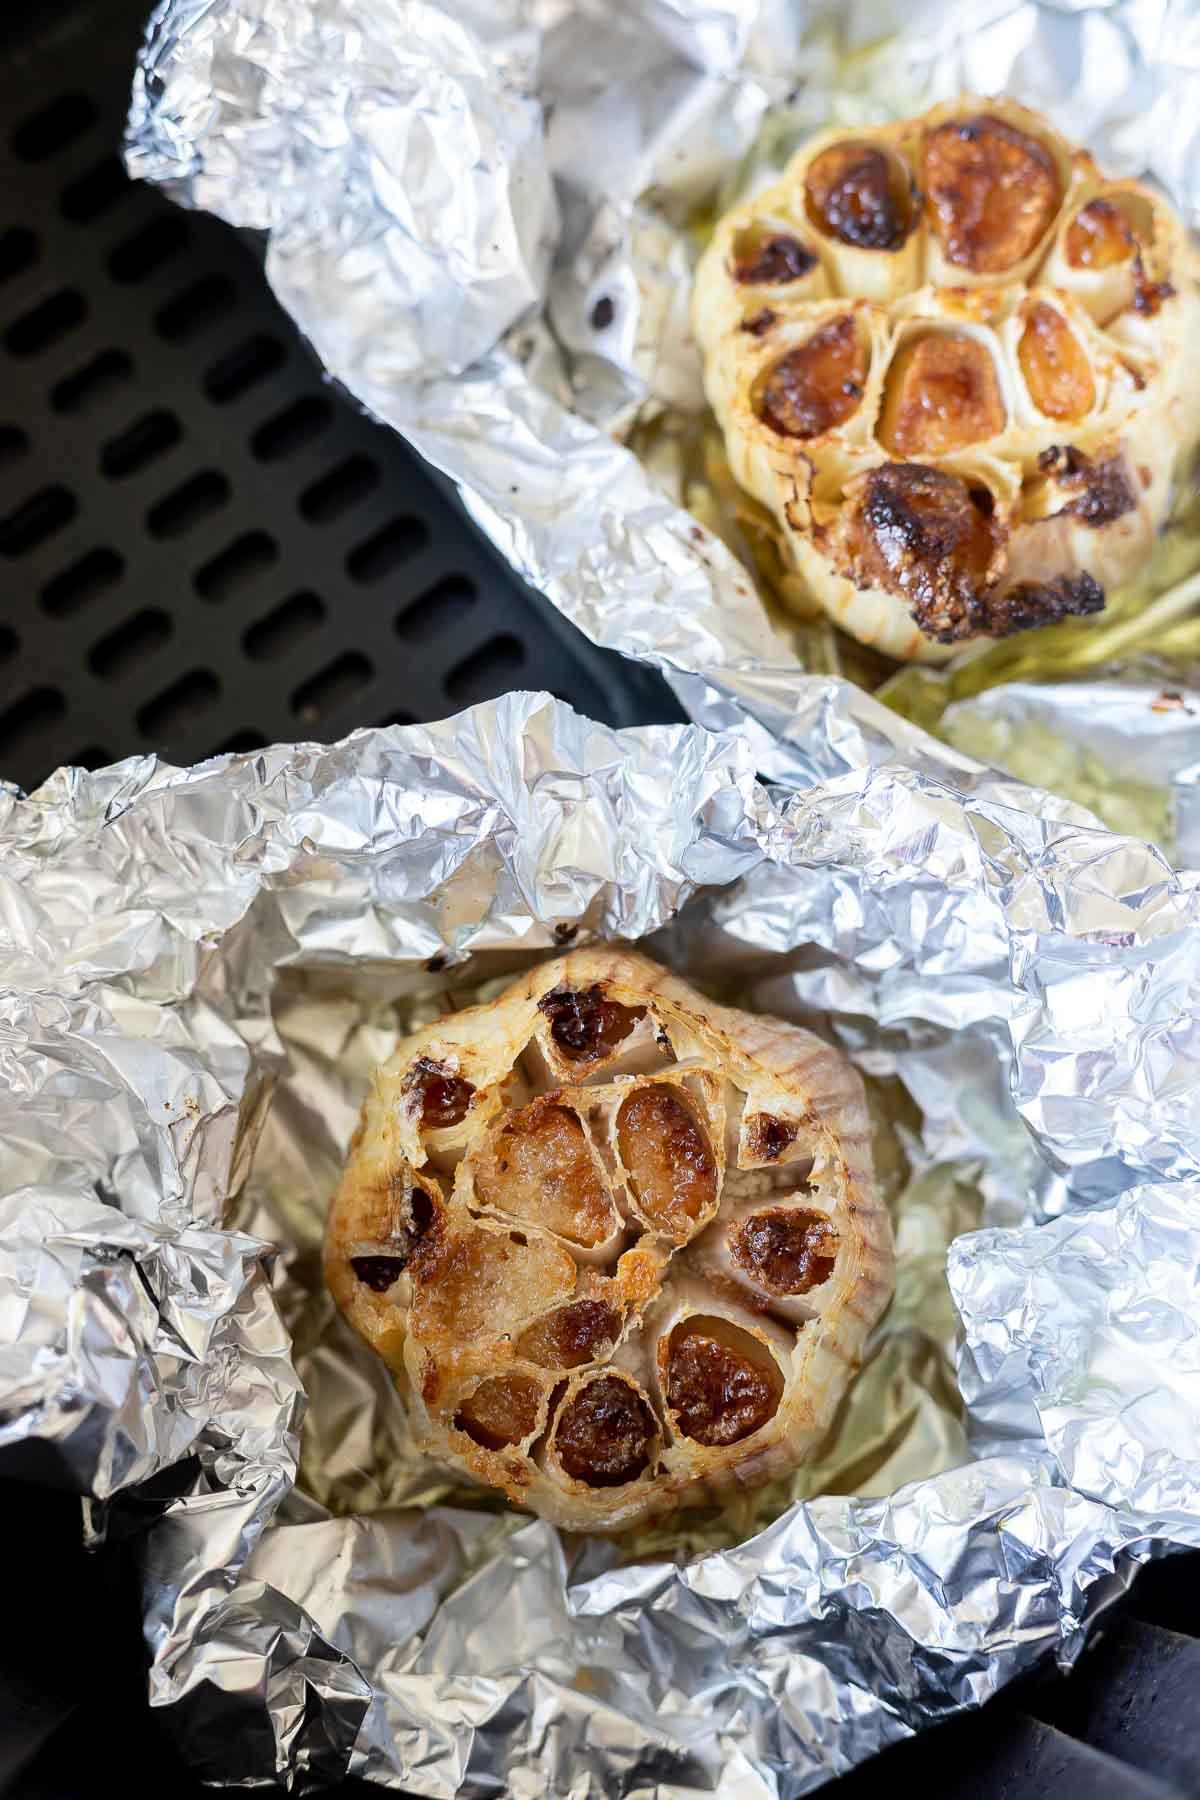 roasted garlic on foil in air fryer basket